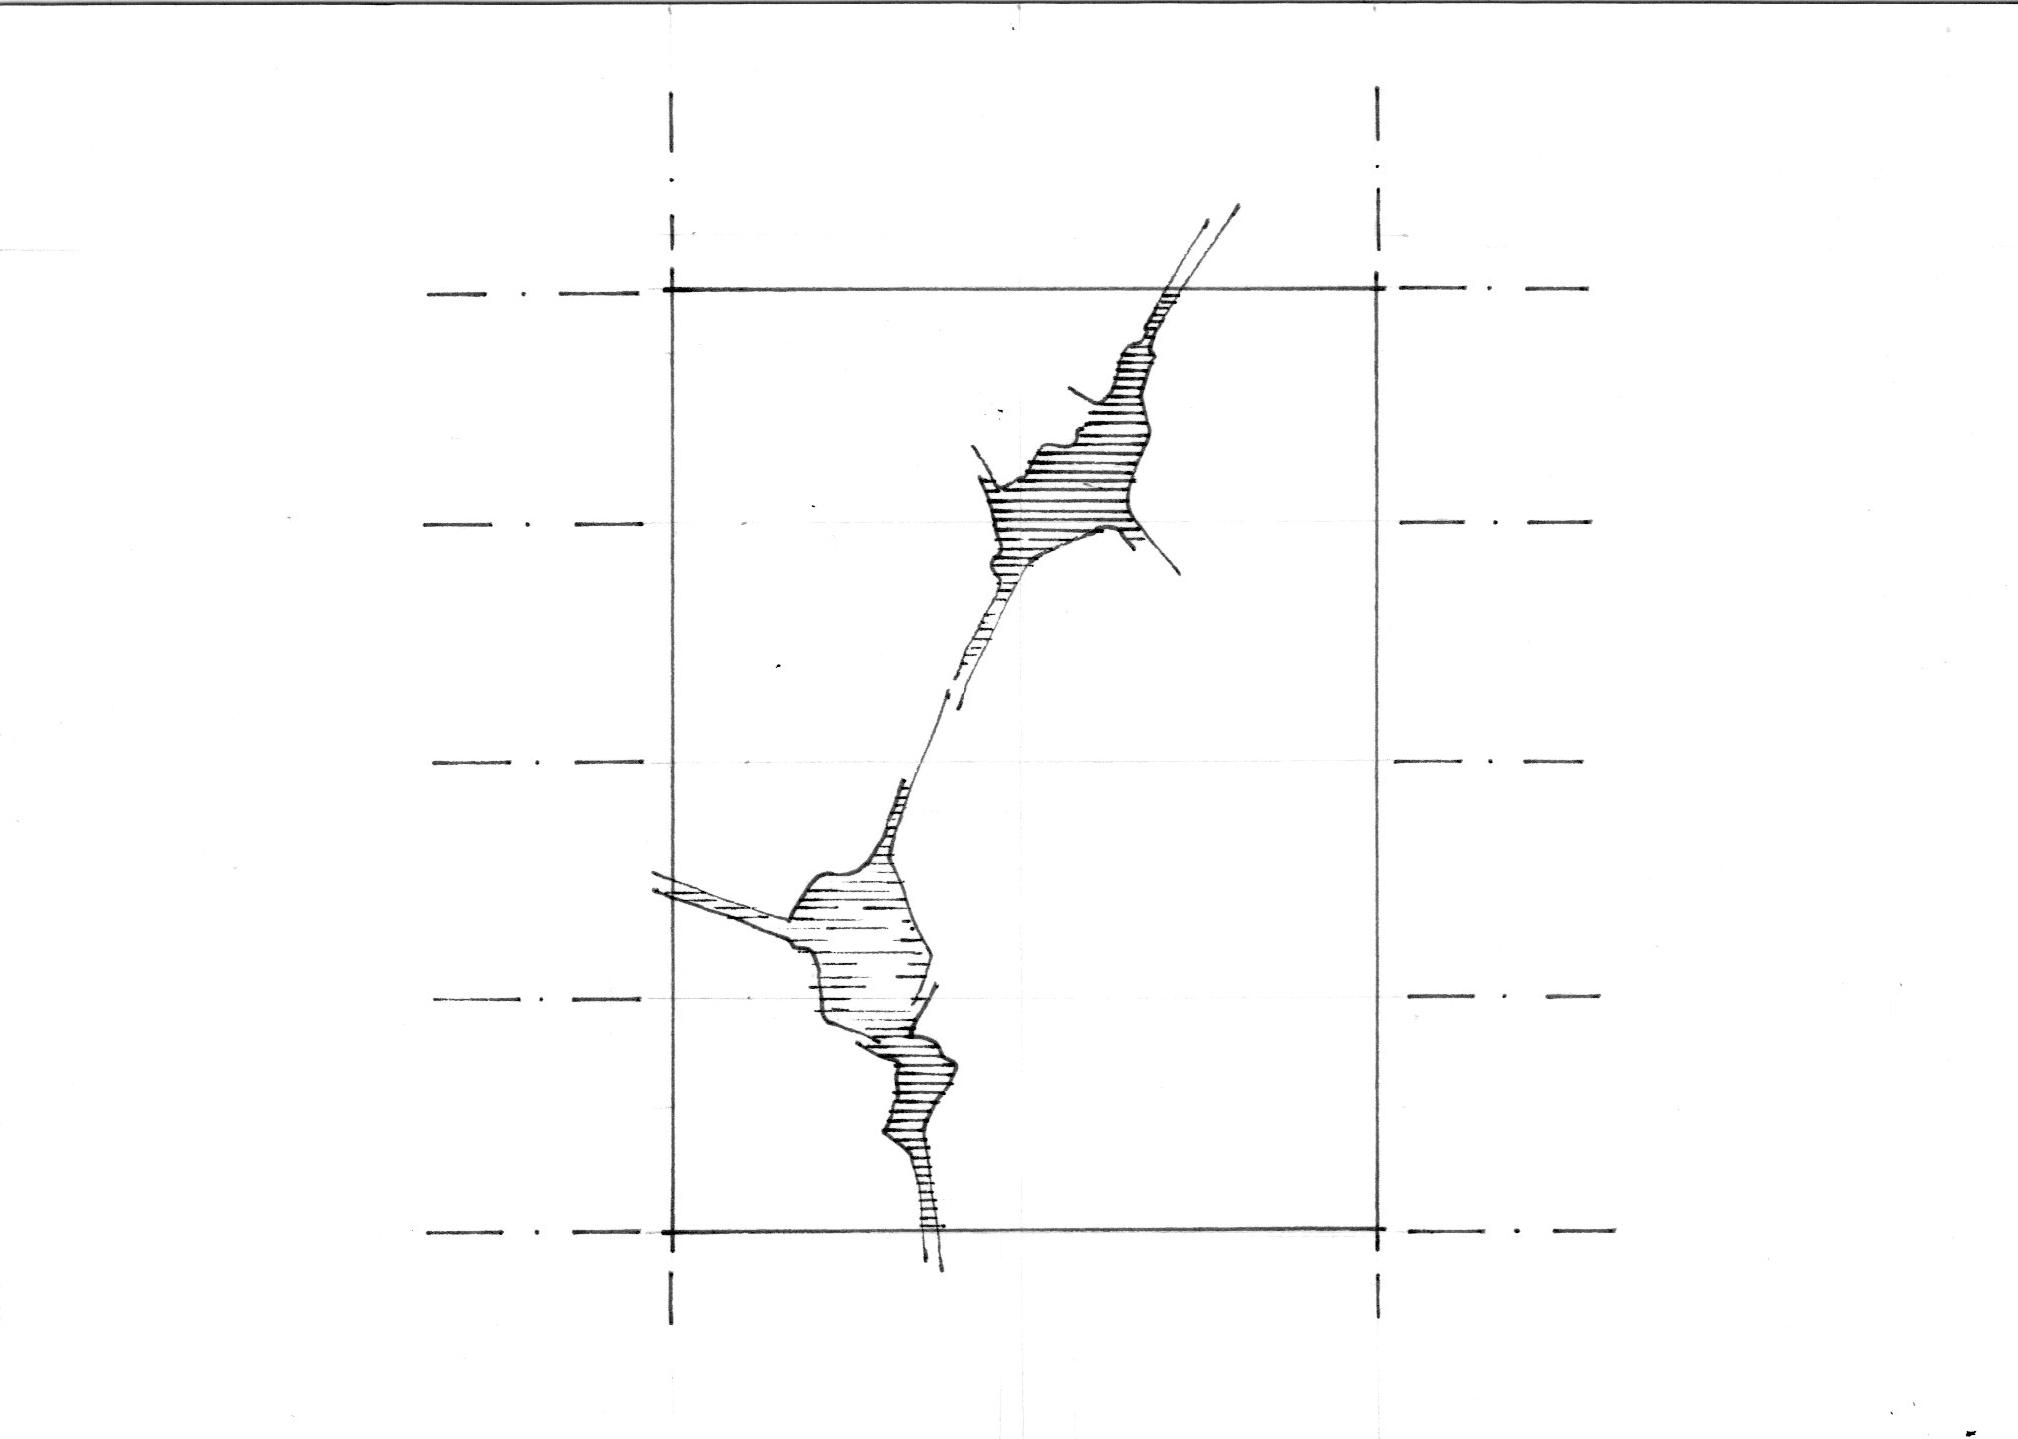 mapa03.jpg